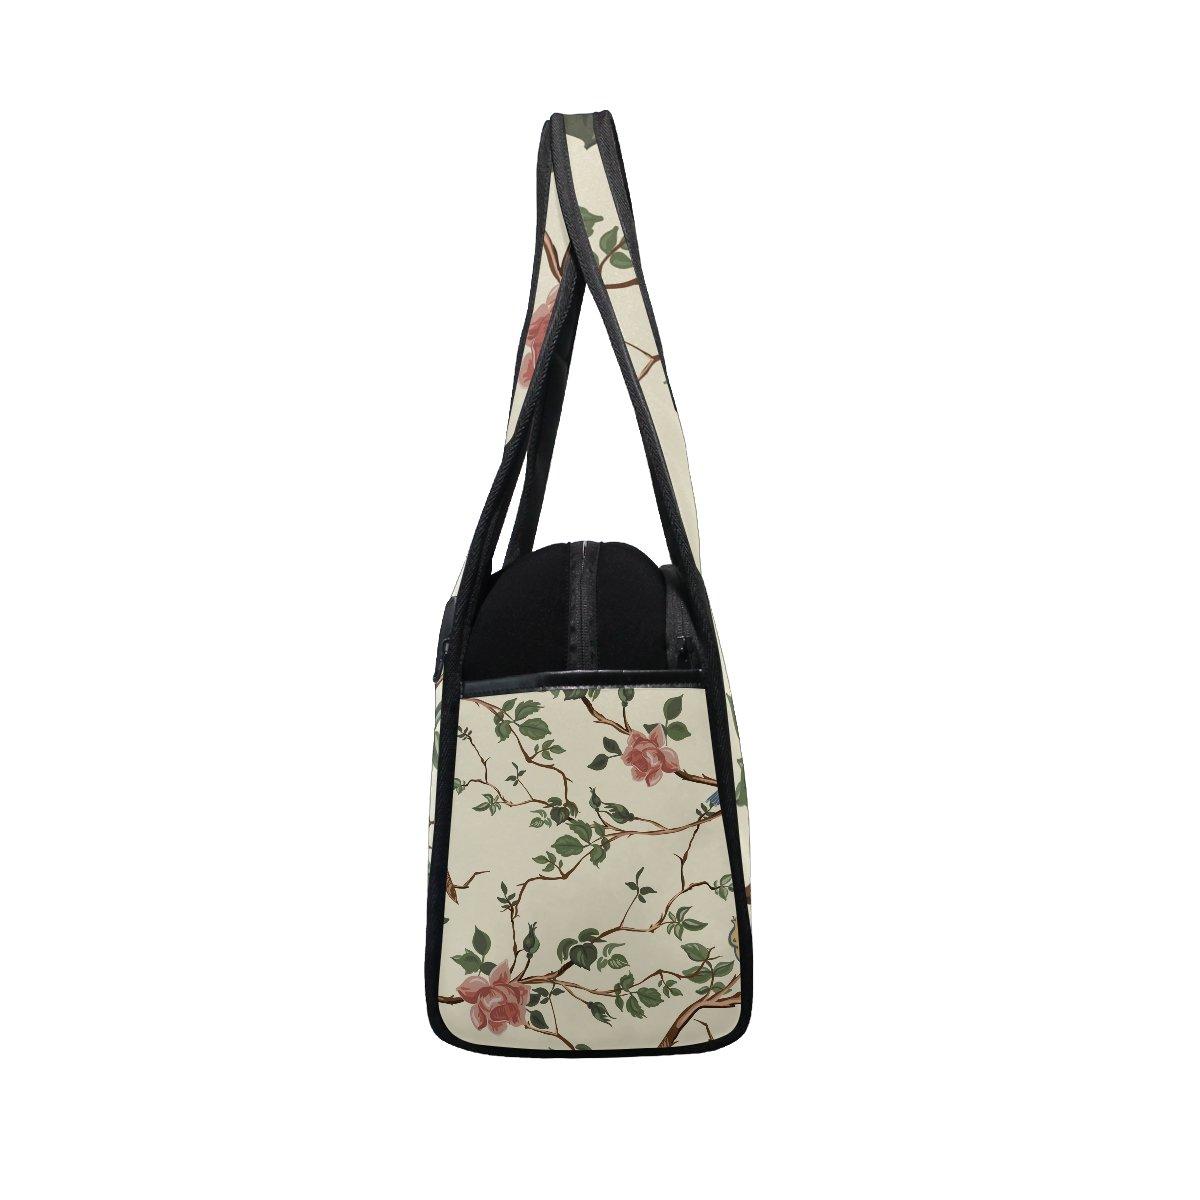 AHOMY Canvas Sports Gym Bag Tree Branches Flowers Bird Travel Shoulder Bag